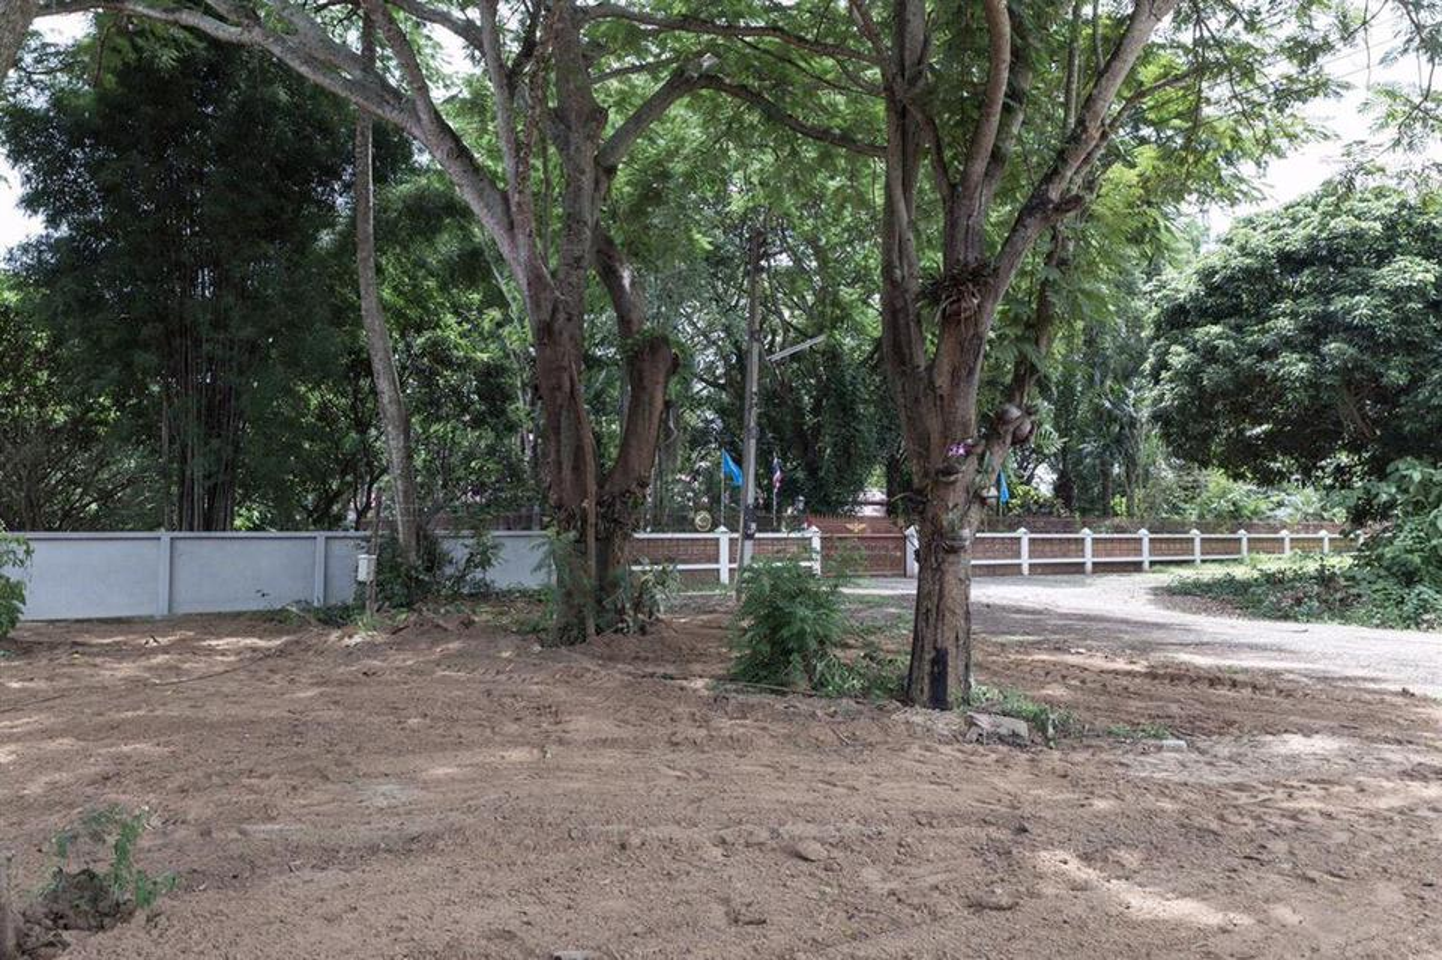 SRP01ขายที่สวนผลไม้2-2-05.7ไร่ติดทางสาธารณประโยชน์ที่เชื่อมก รูปที่ 2